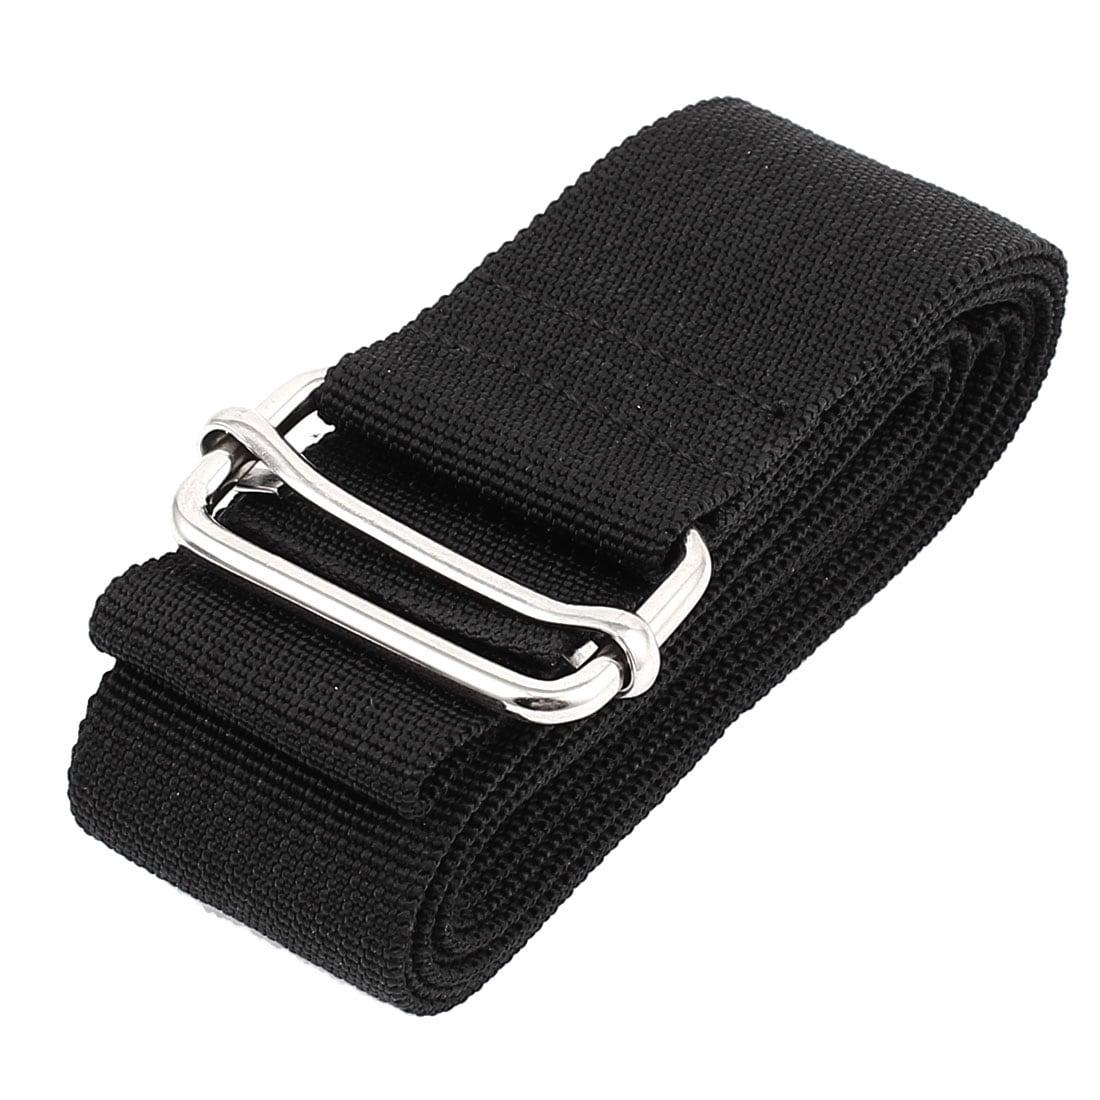 Quick Release Buckle Luggage Suitcase Backpack Baggage Belt Strap Black 10Ft